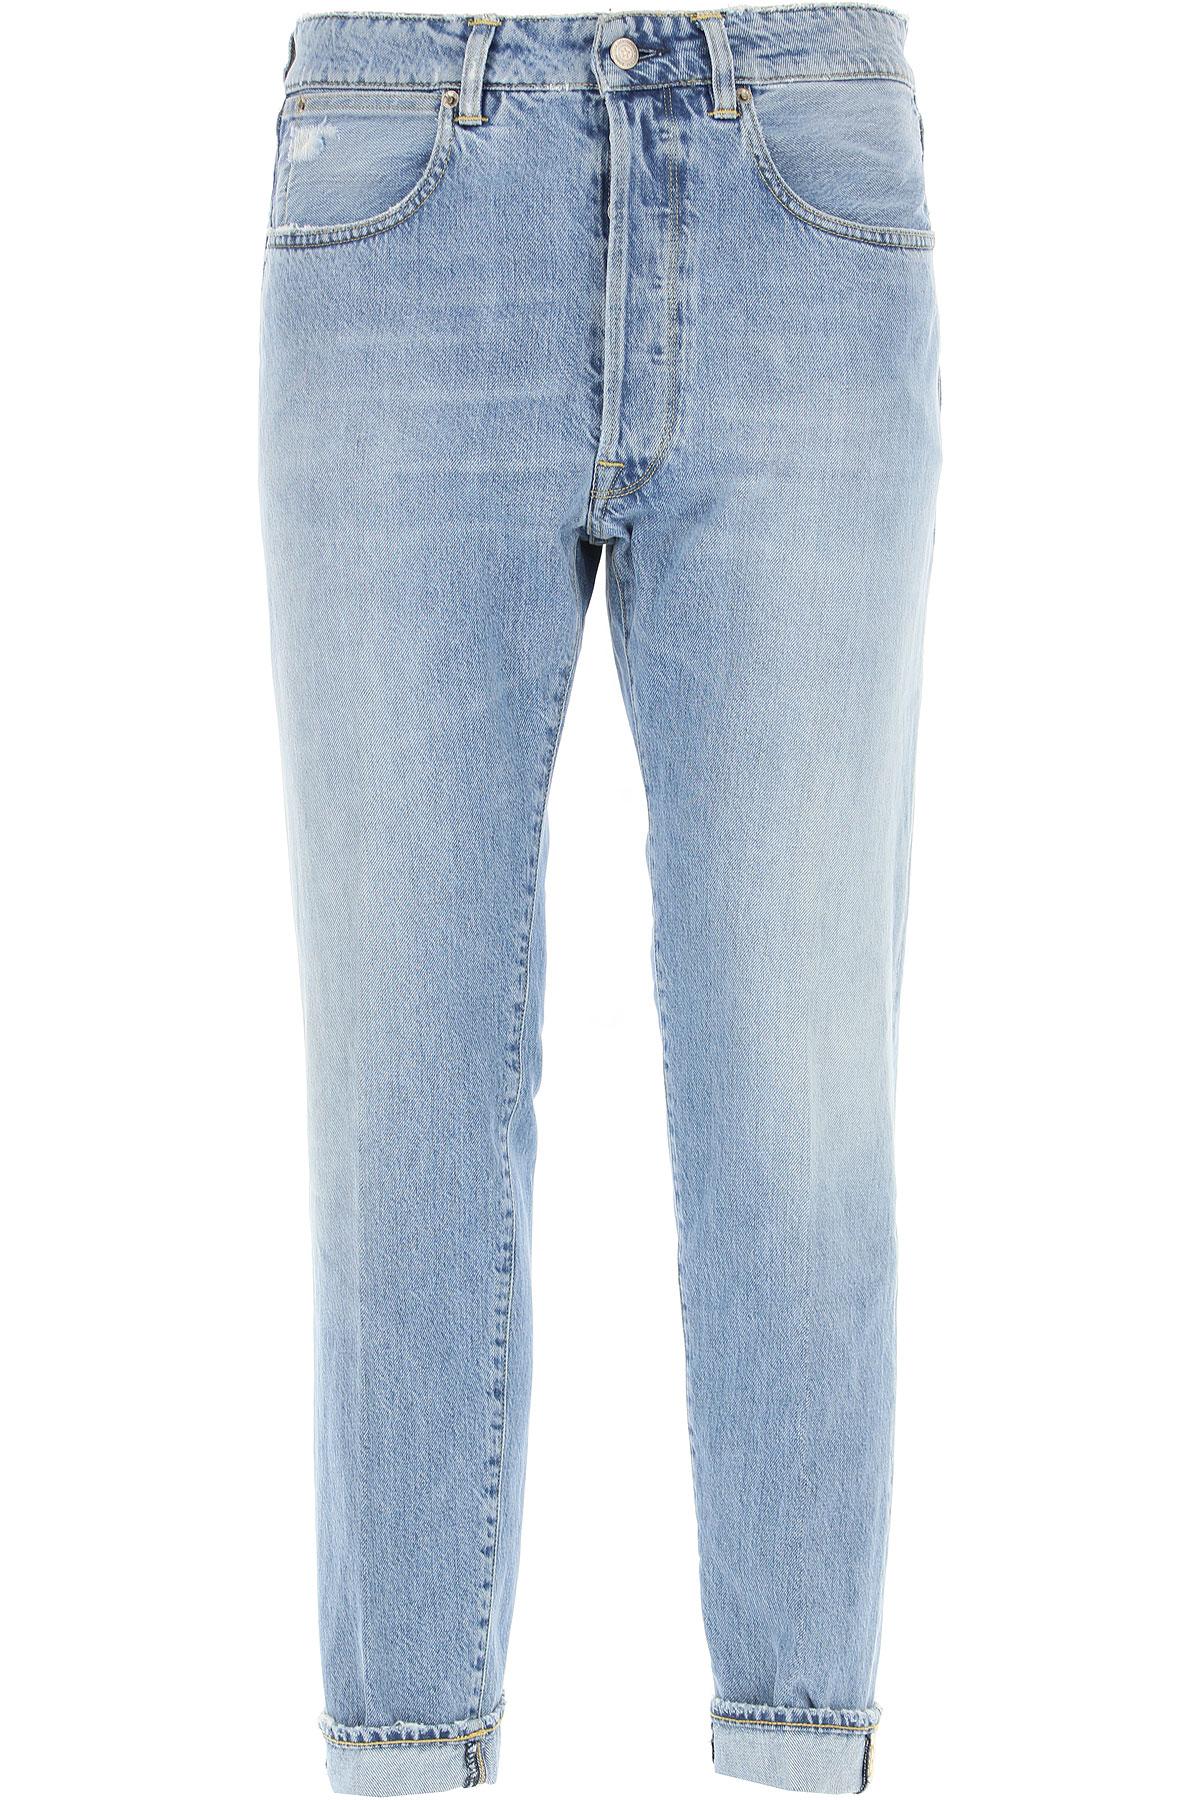 Golden Goose Jeans On Sale, Light Blue Denim, Cotton, 2019, 30 31 32 33